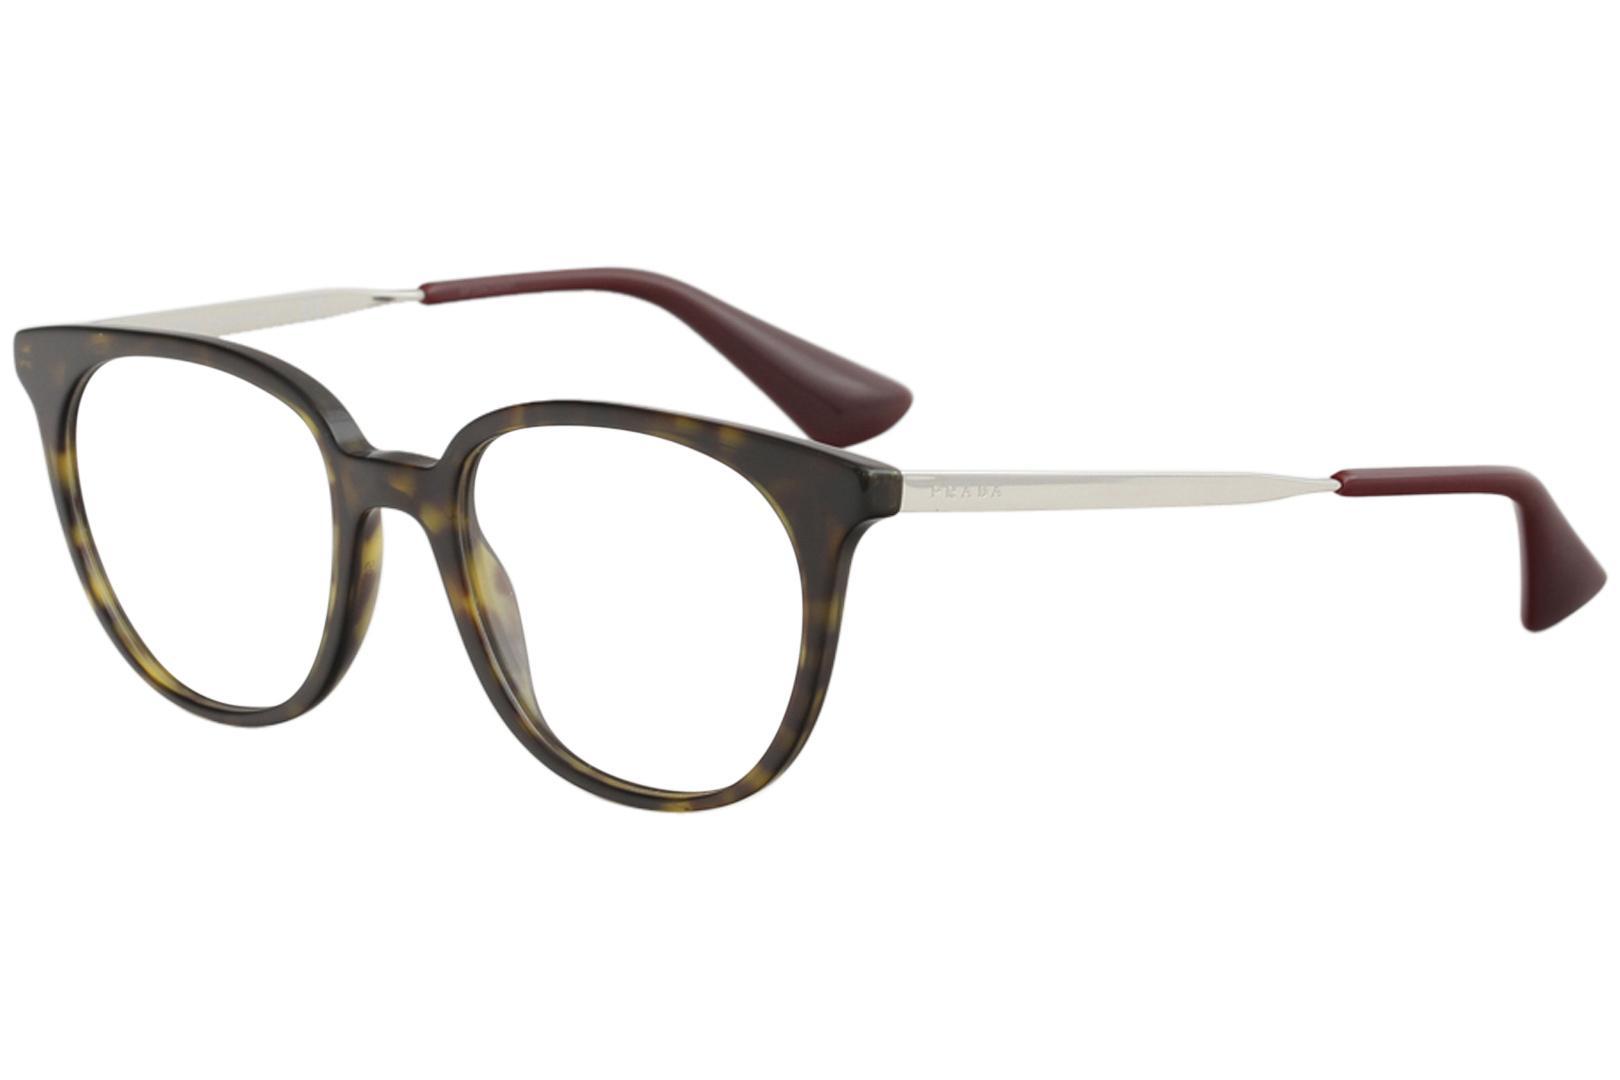 Prada Women's Eyeglasses VPR13U VPR/13U Full Rim Optical Frame